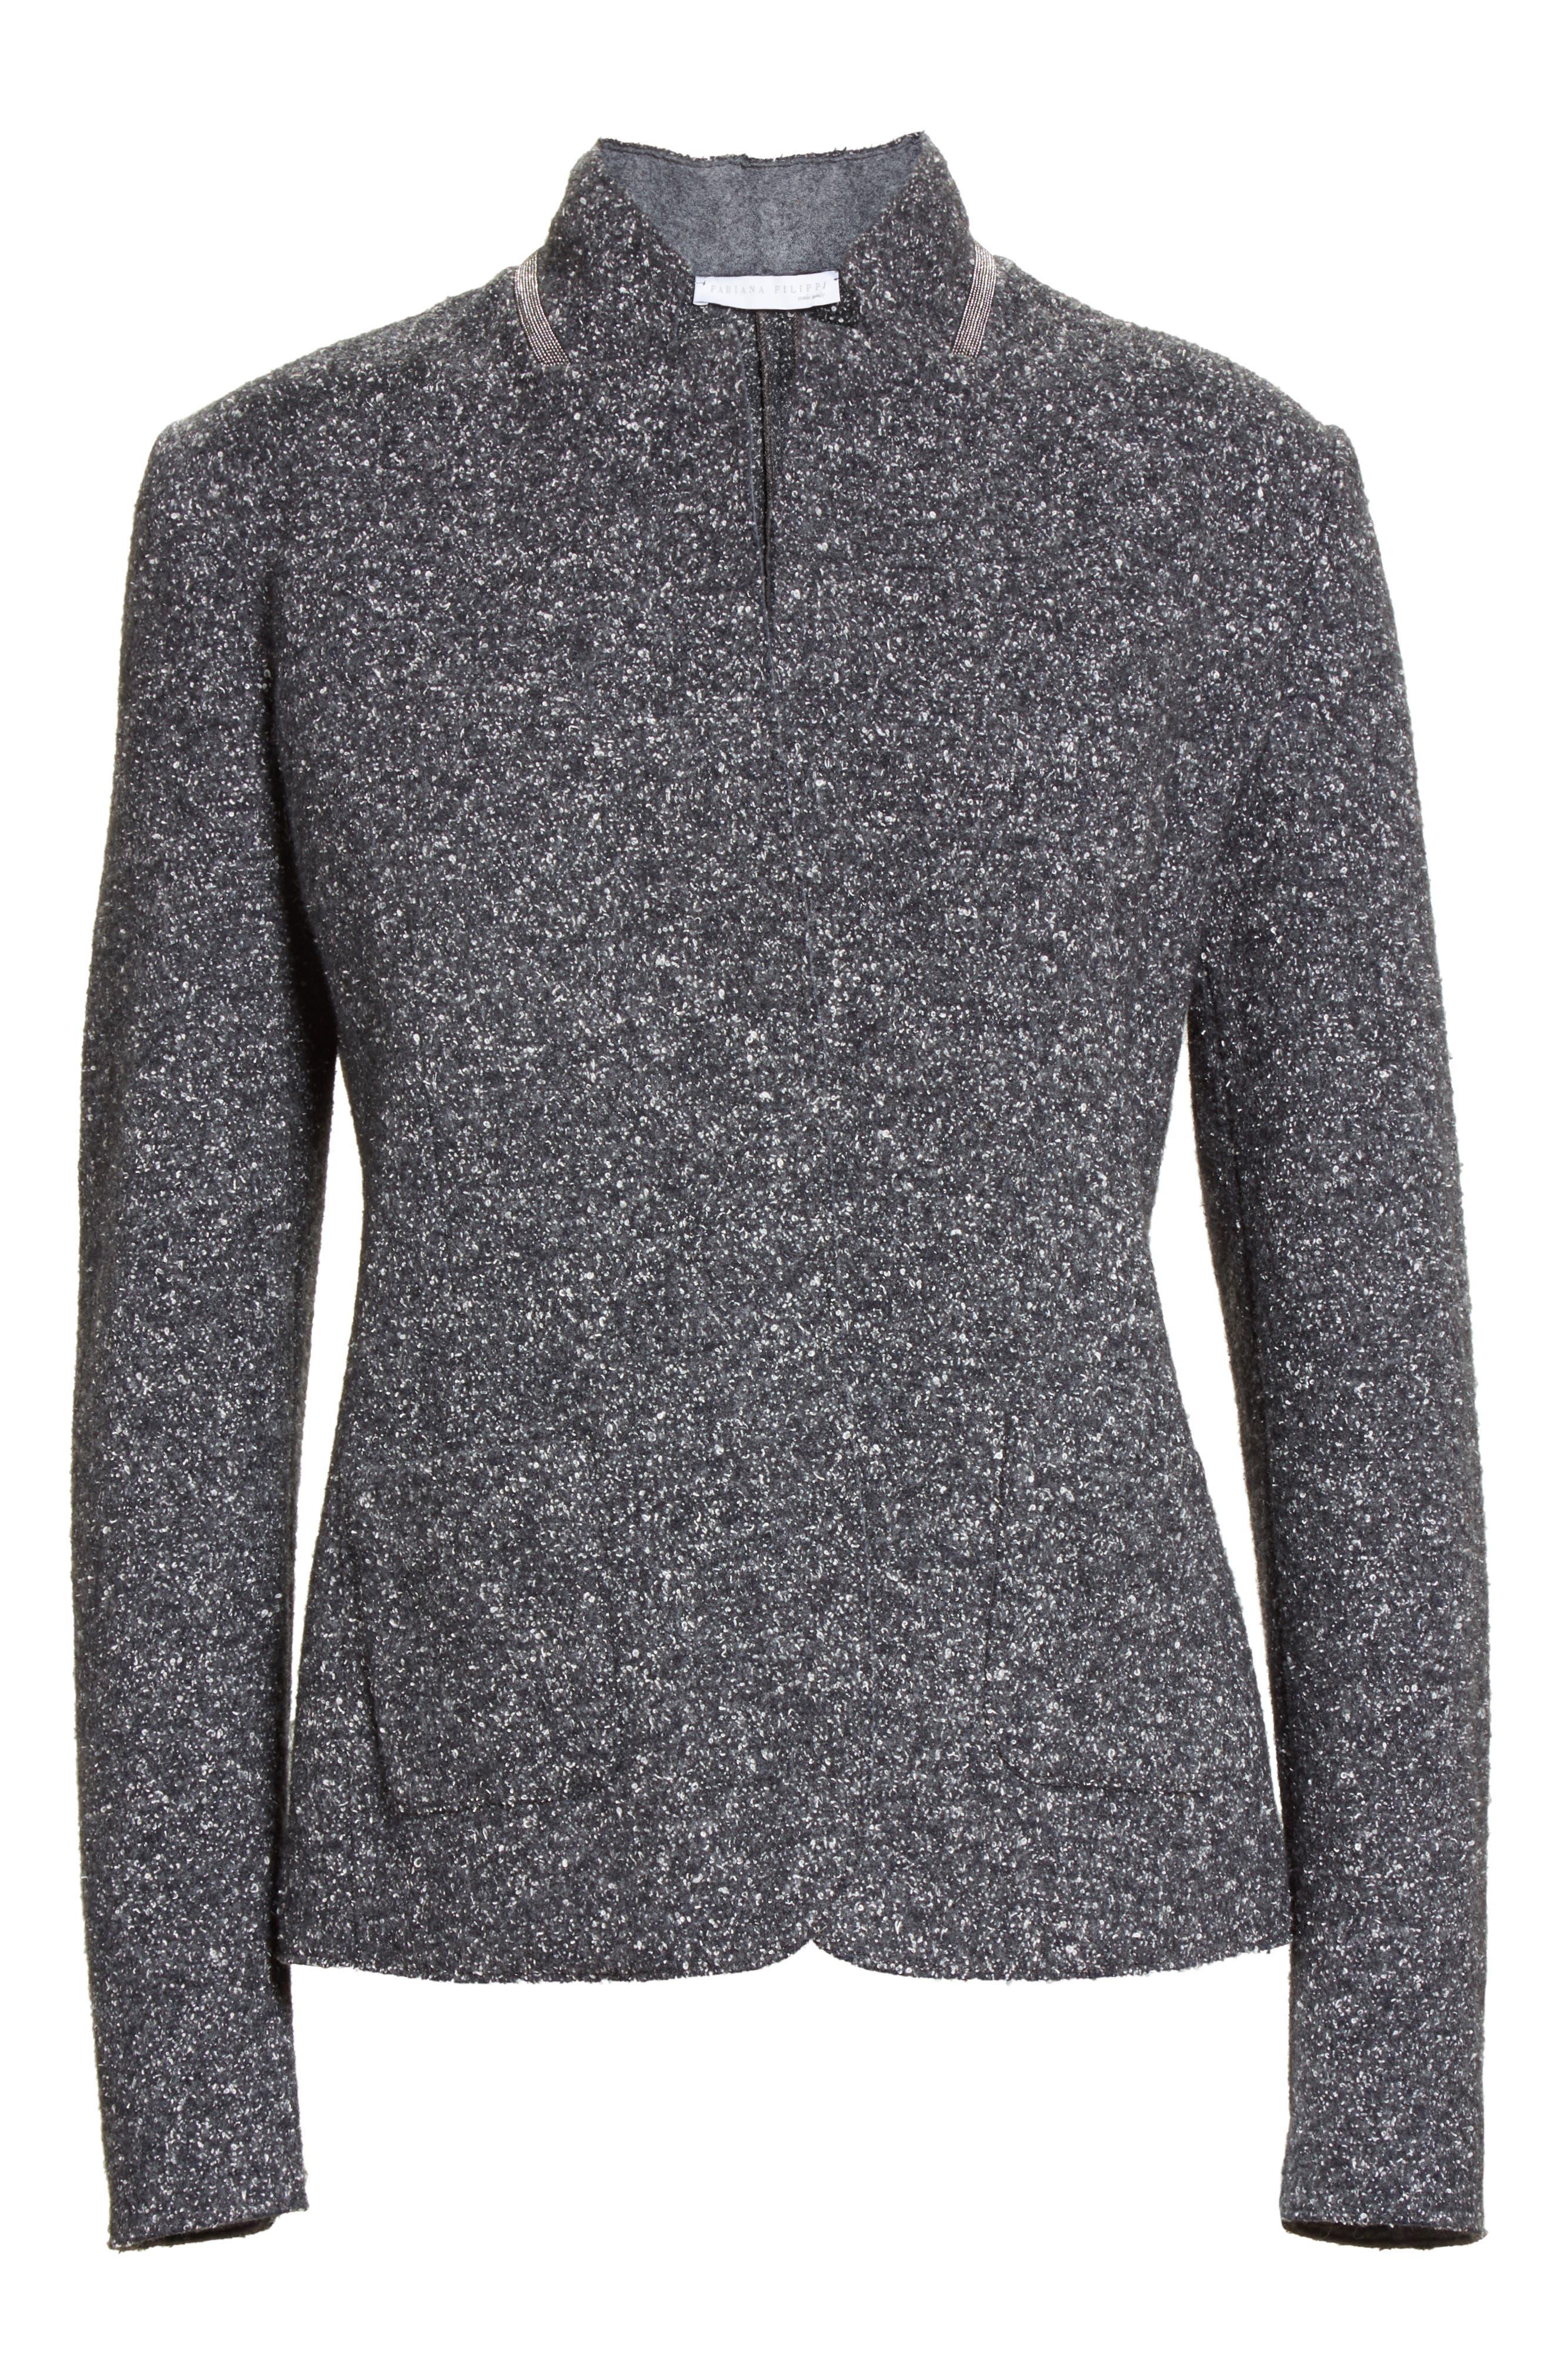 Pebble Tweed Knit Jacket,                             Alternate thumbnail 2, color,